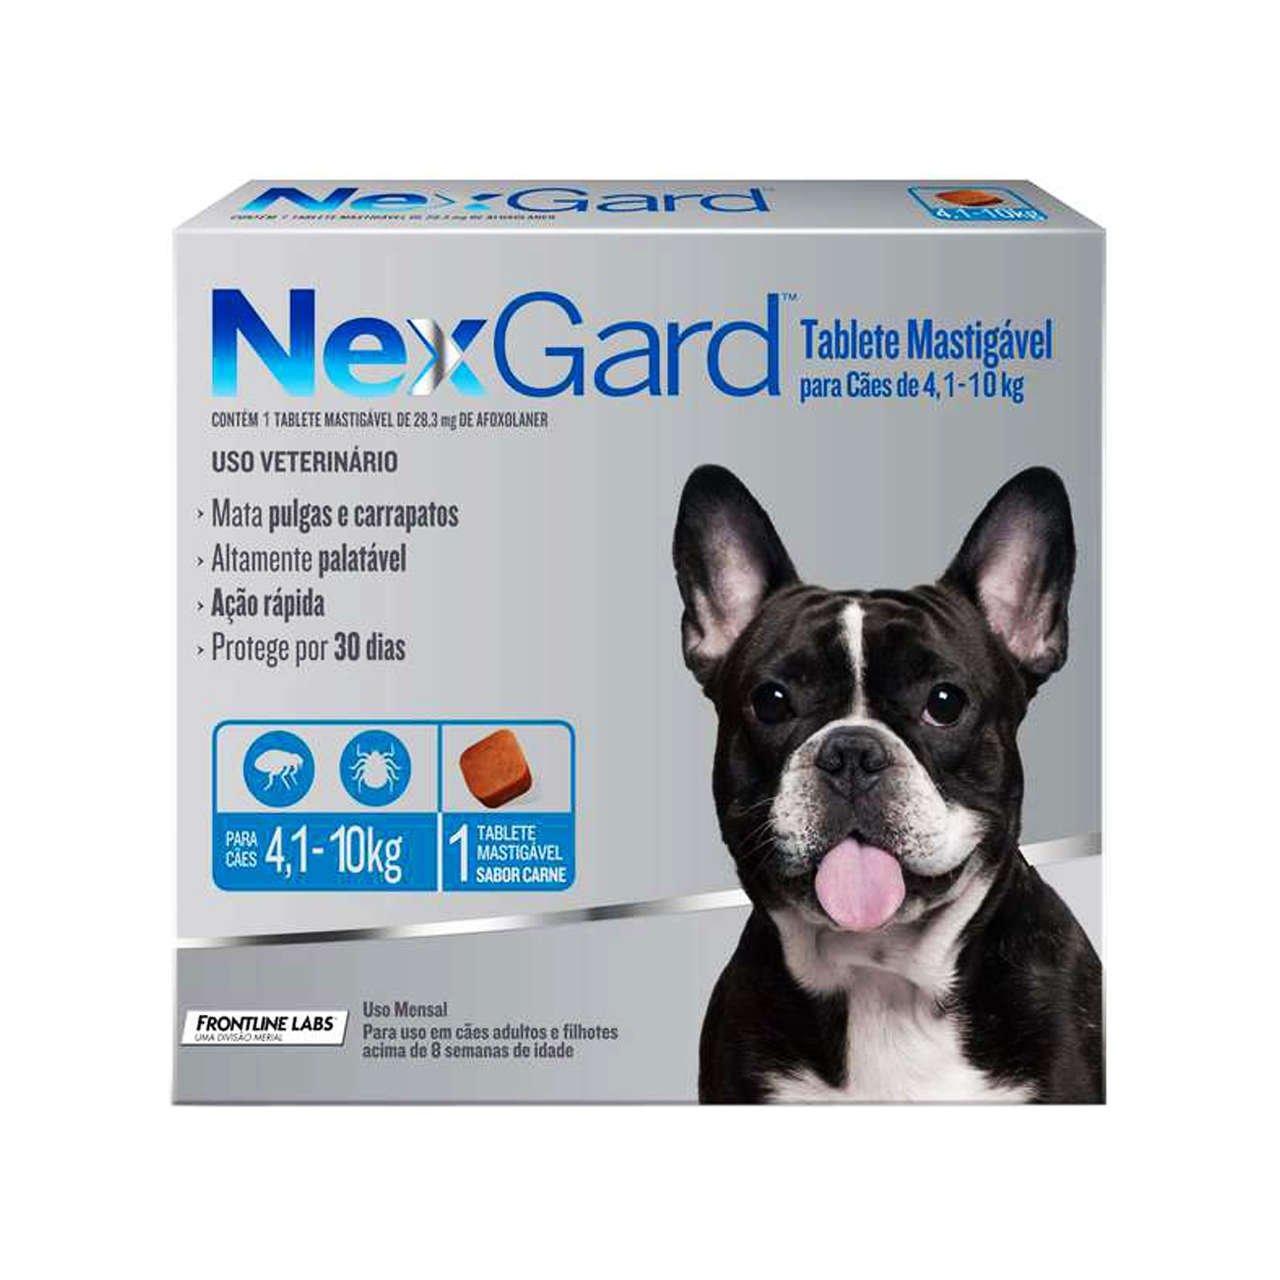 Nexgard 4 a 10 kg (Caixa c/ 1 Comprimido)